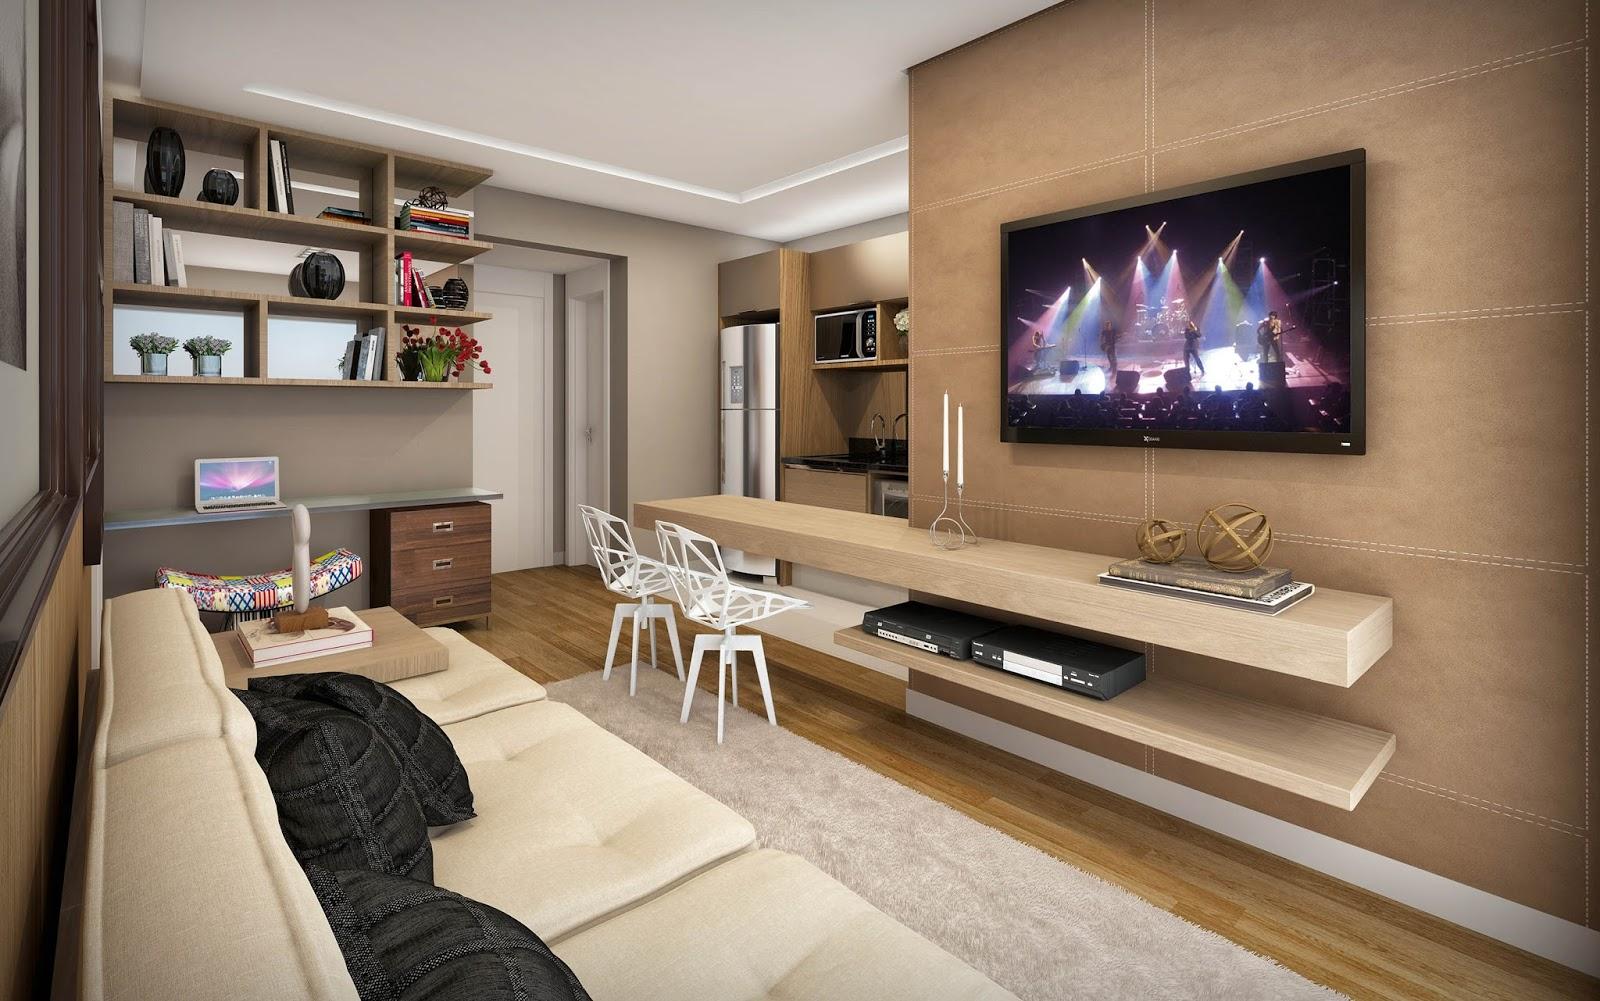 Construindo minha casa clean 20 home office pequenos na for Salas de television modernas